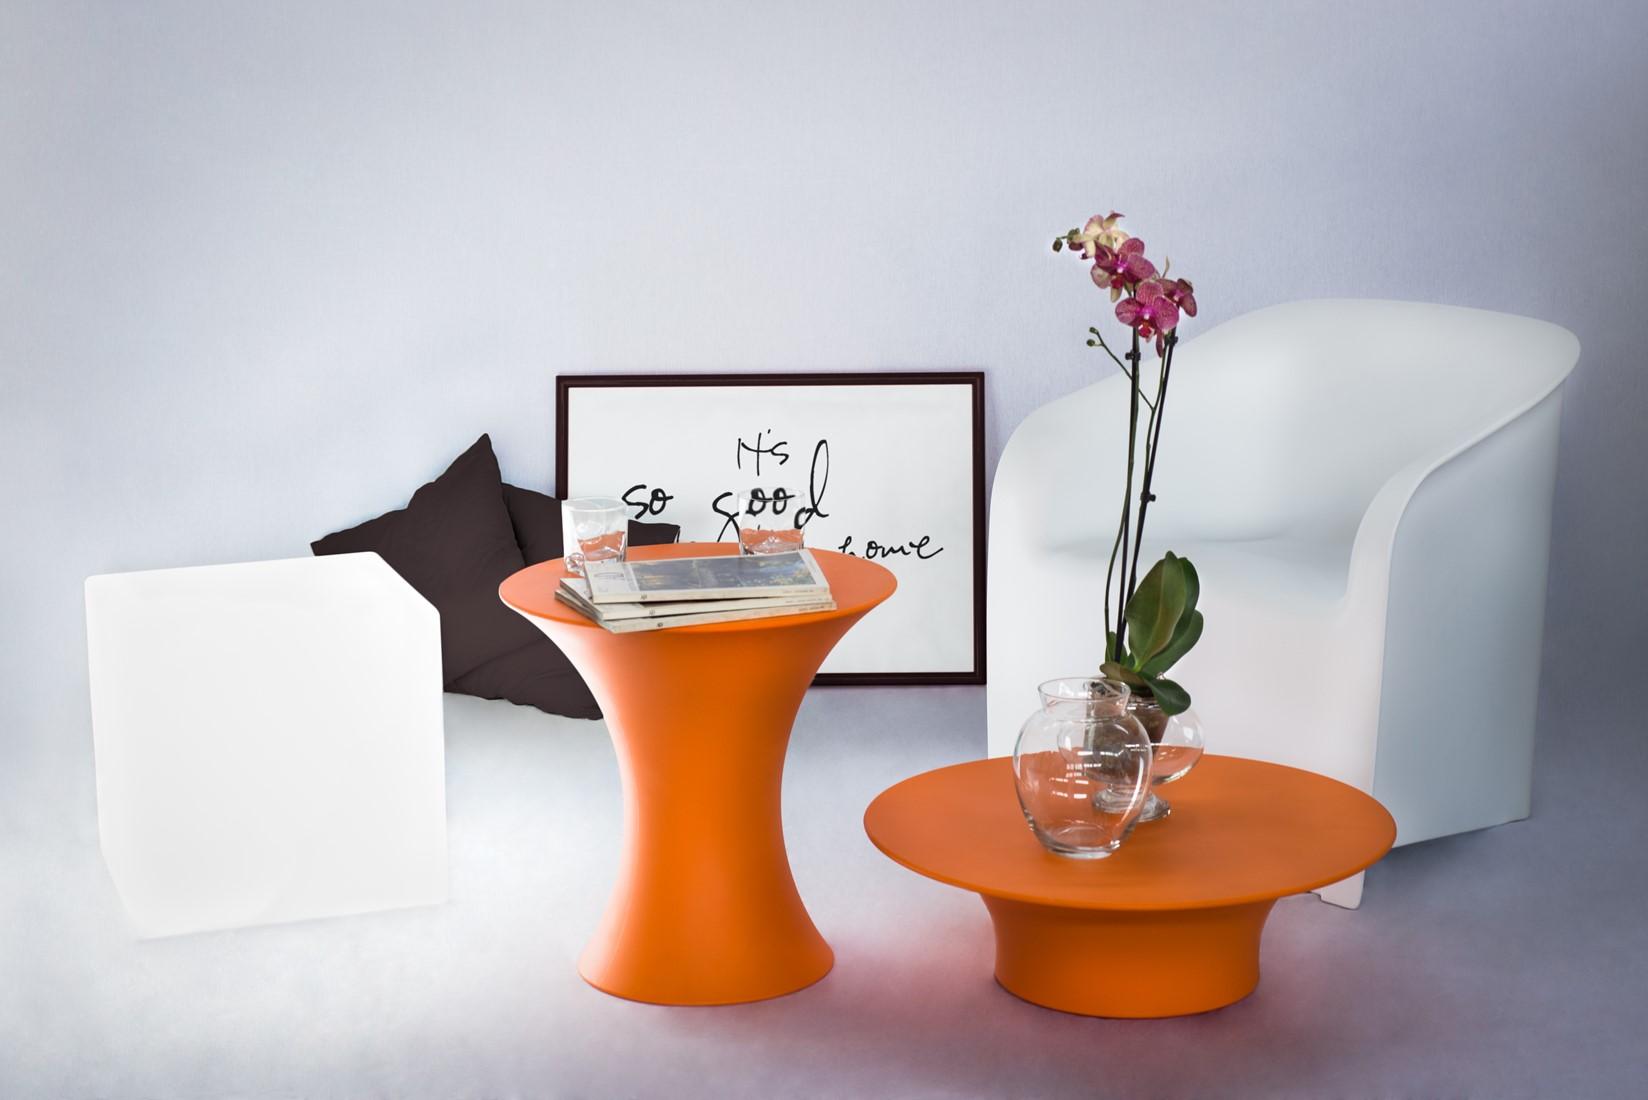 Lady kunststof stoel plart design kunststof stoel oranje ar